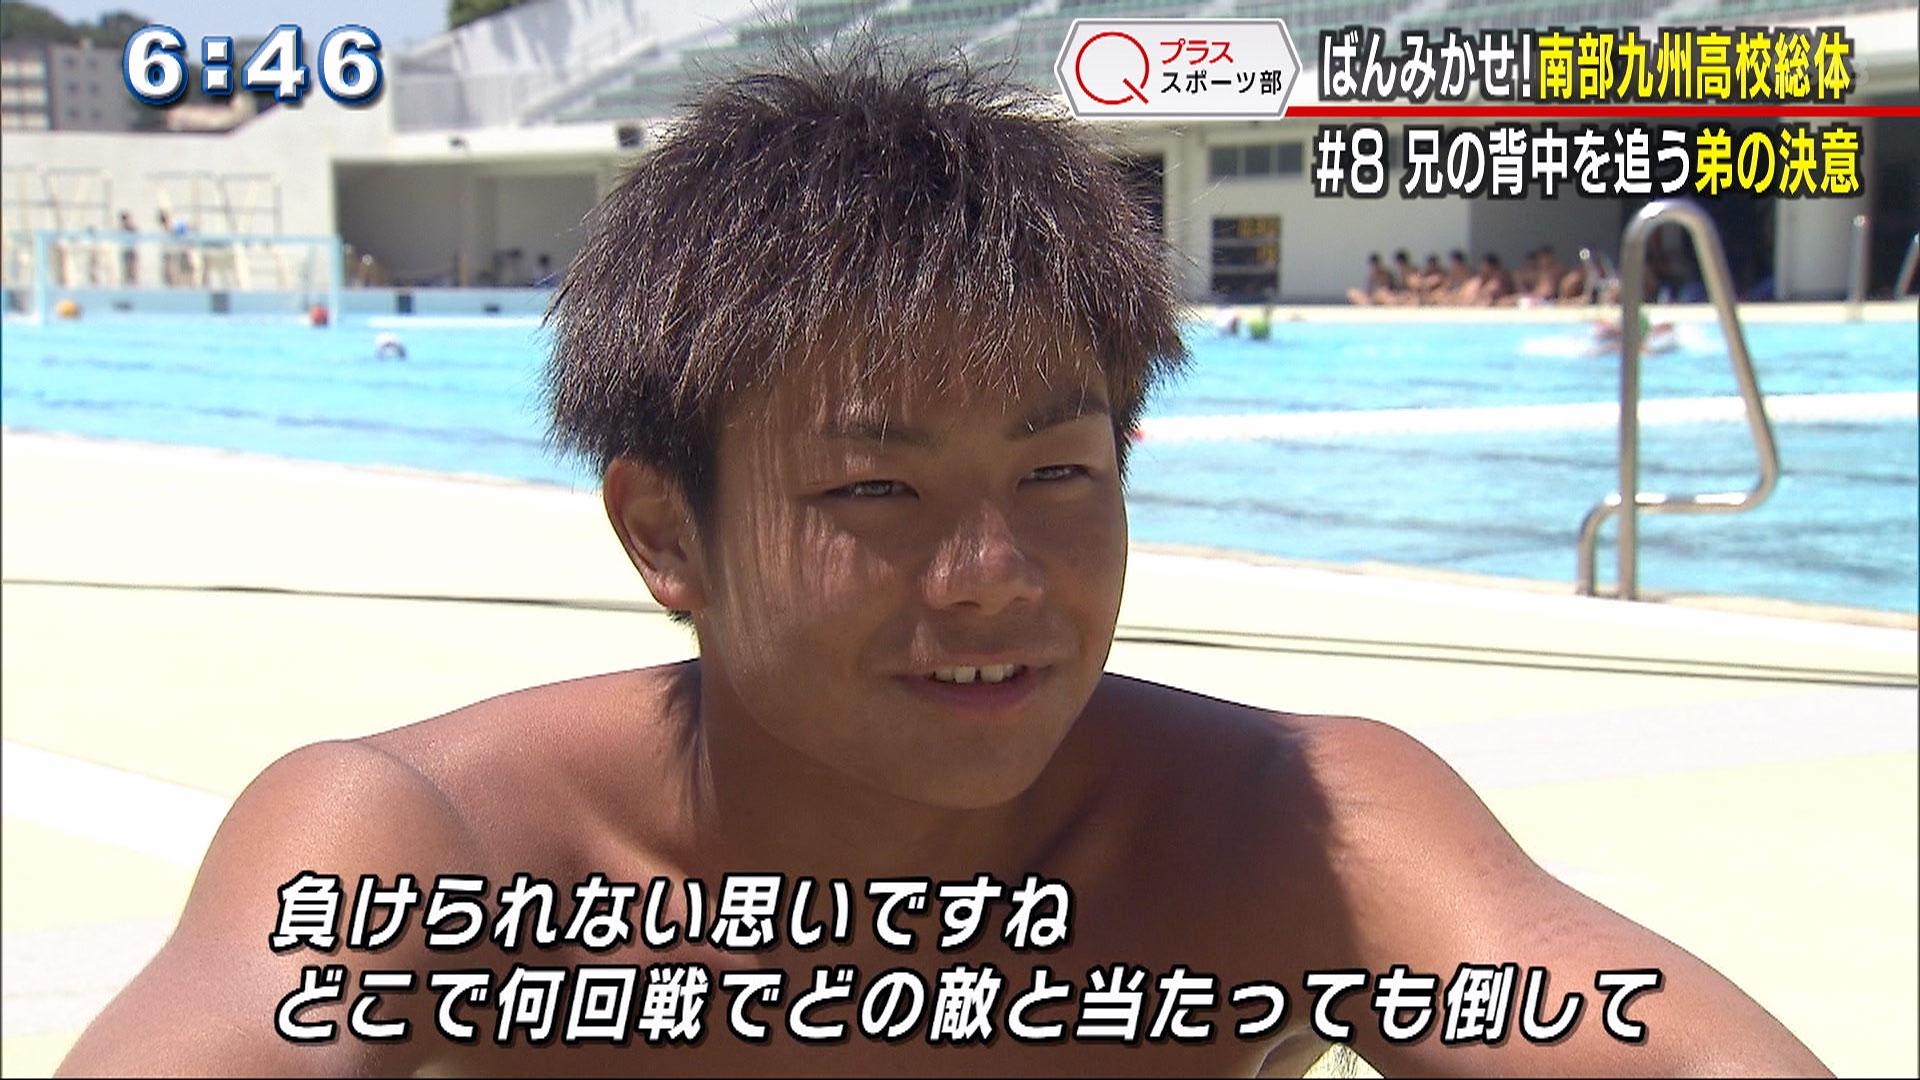 Qプラススポーツ部 ばんみかせ(8) 水球・仲本虎次郎 兄を超え全国の頂点へ